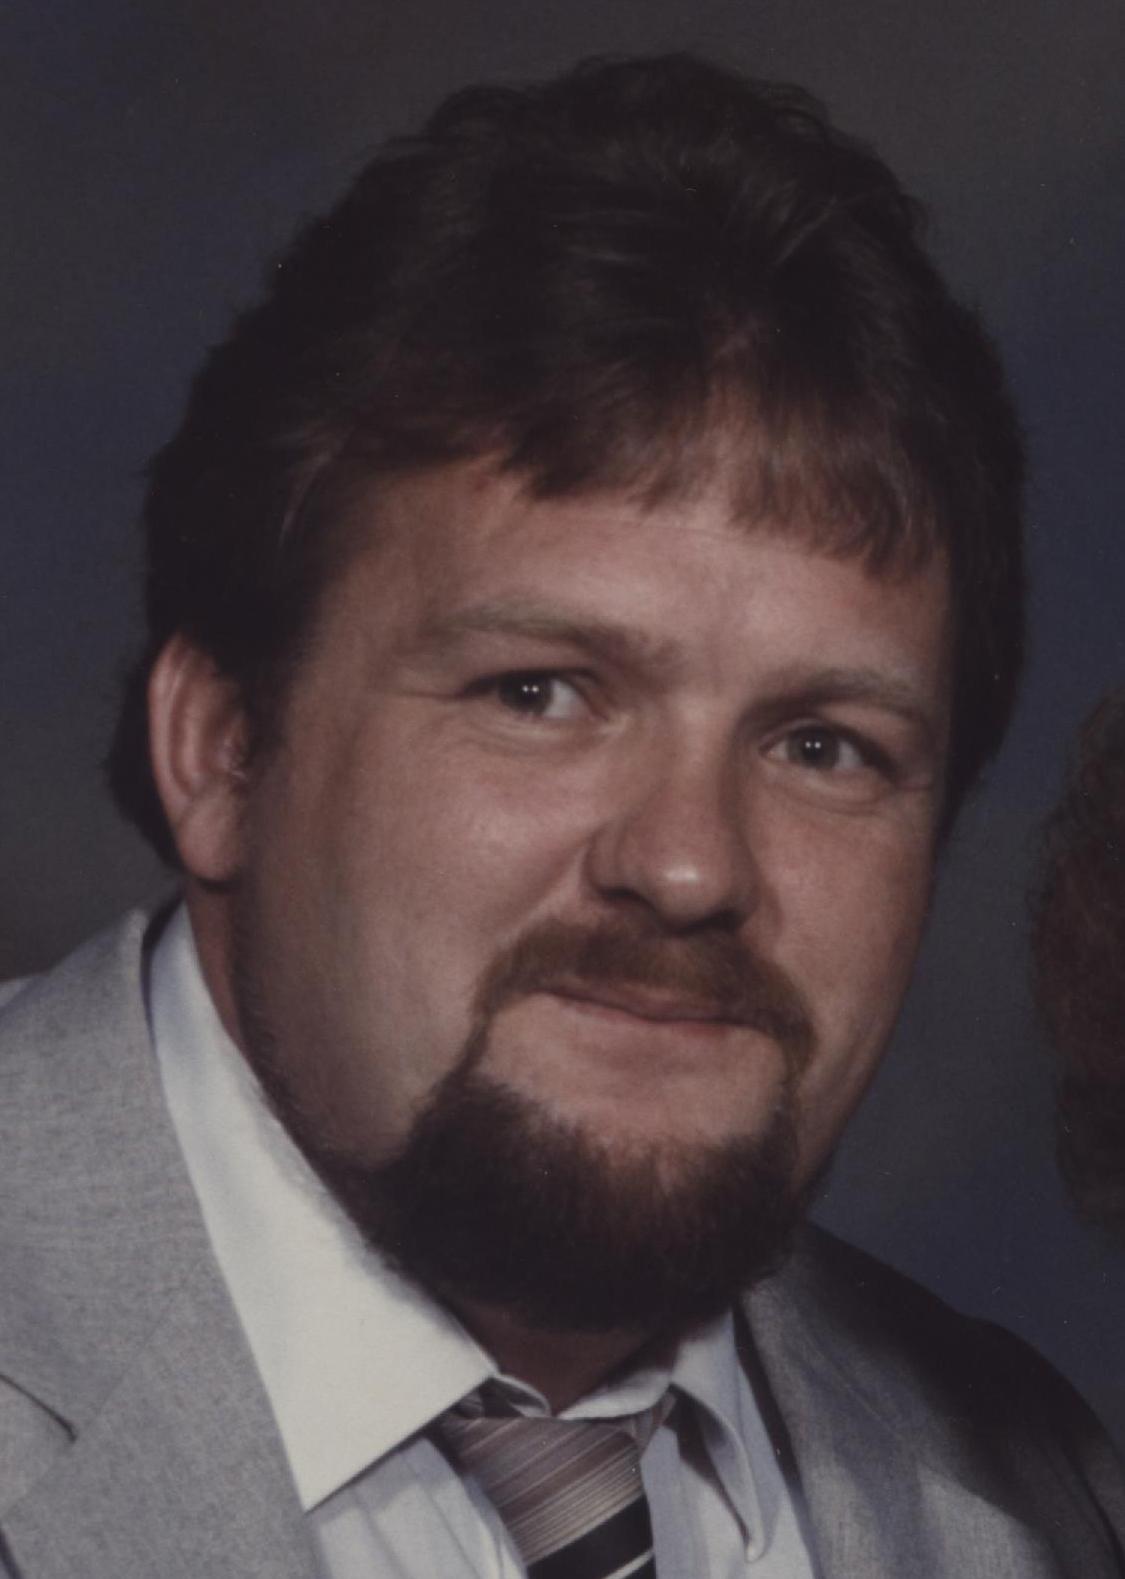 Terry Wayne Petry, age 60, of Huntingburg